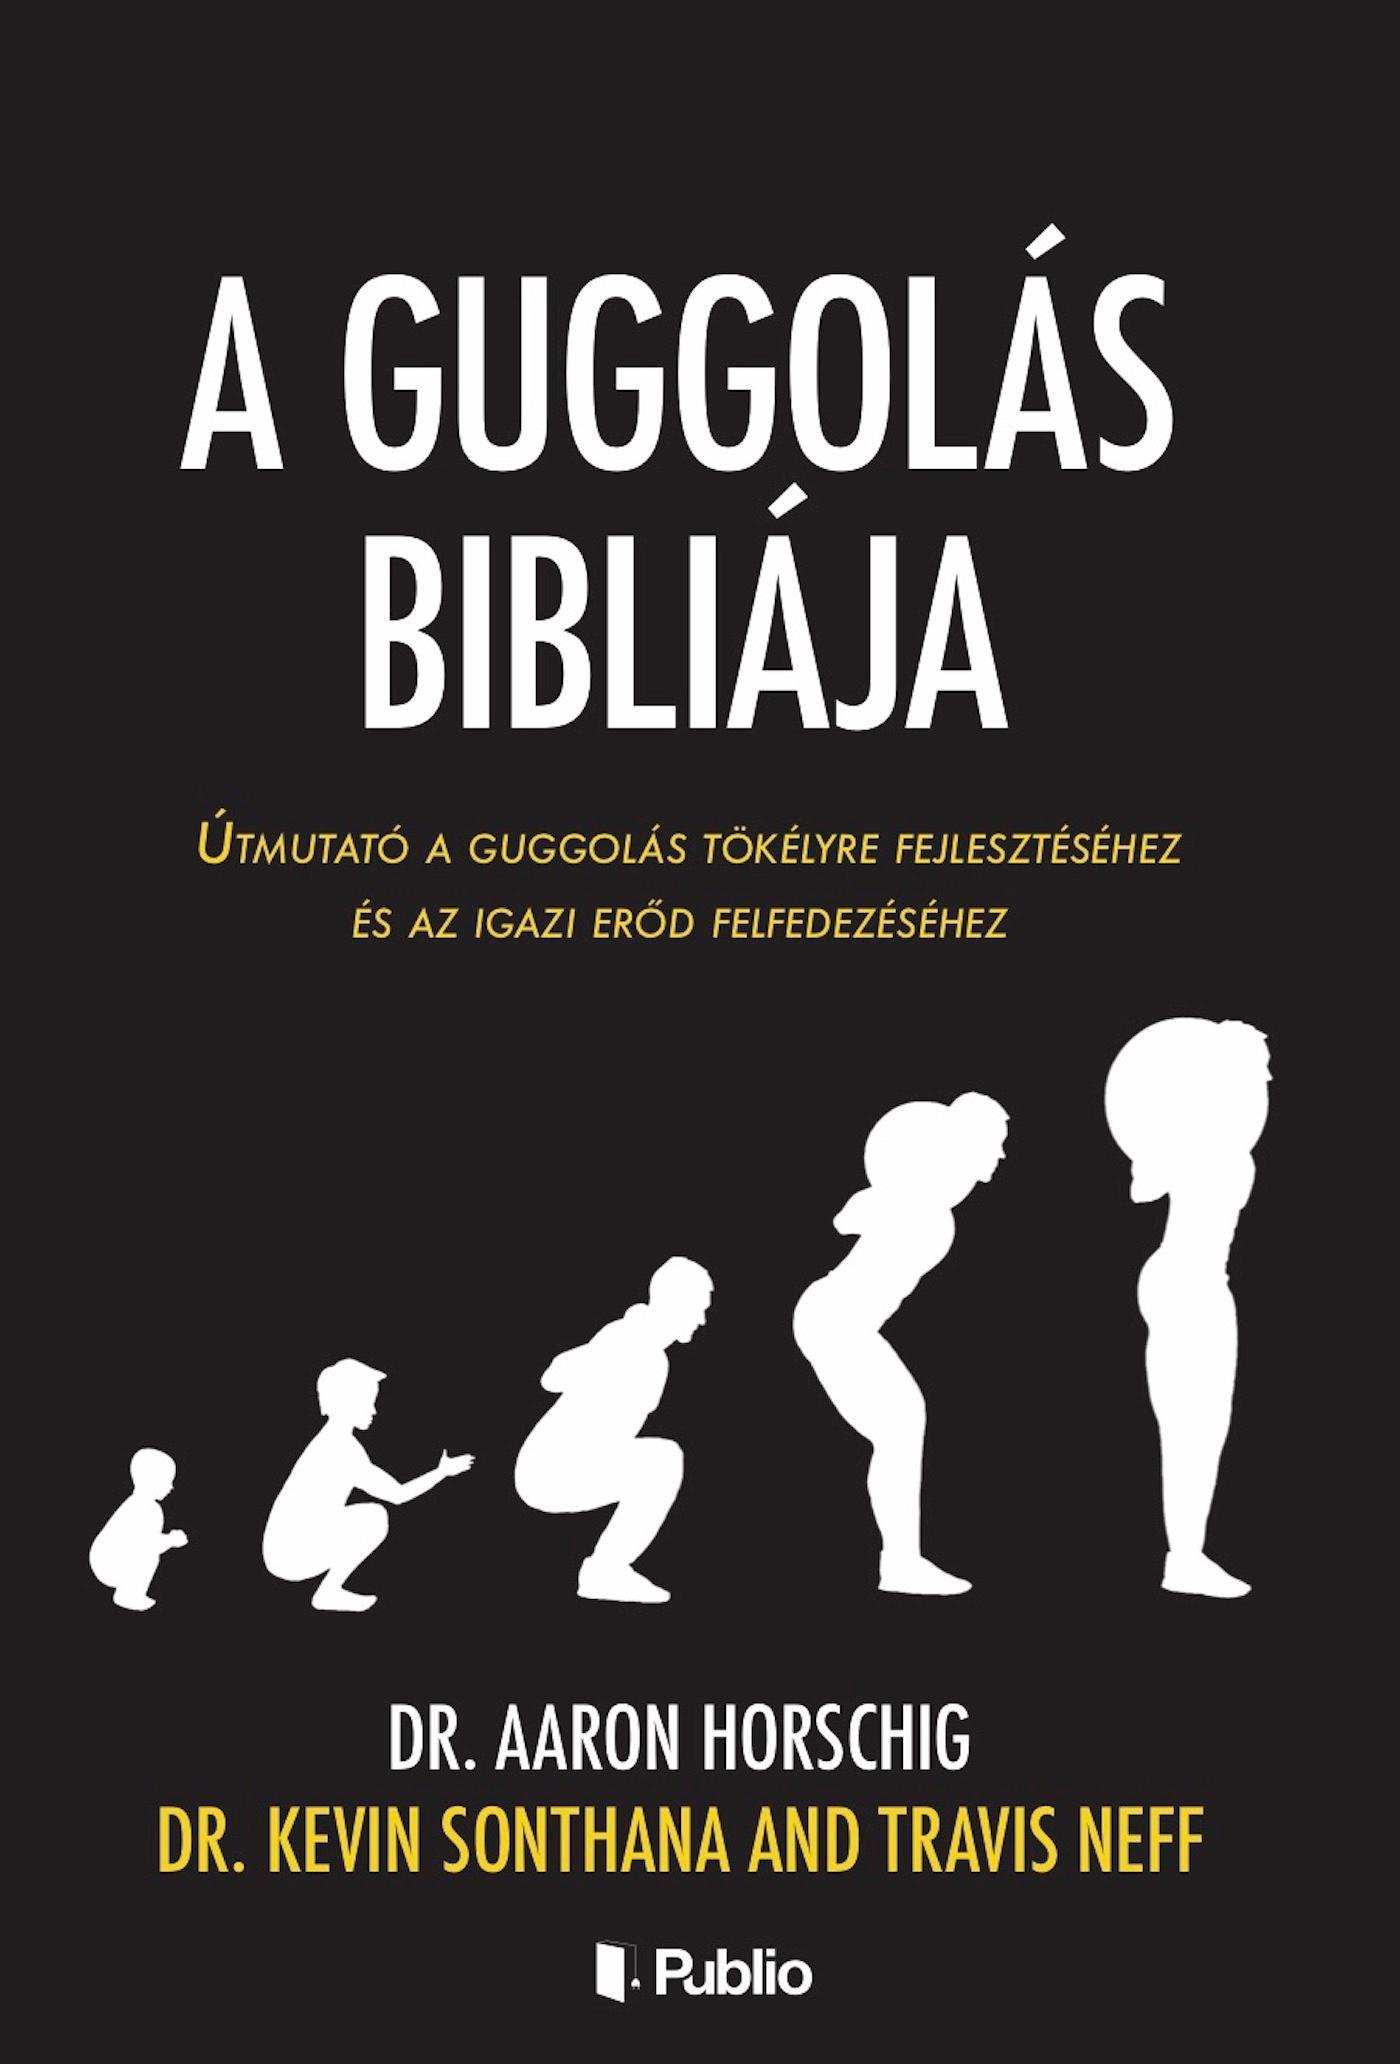 Guggolás Bibliája